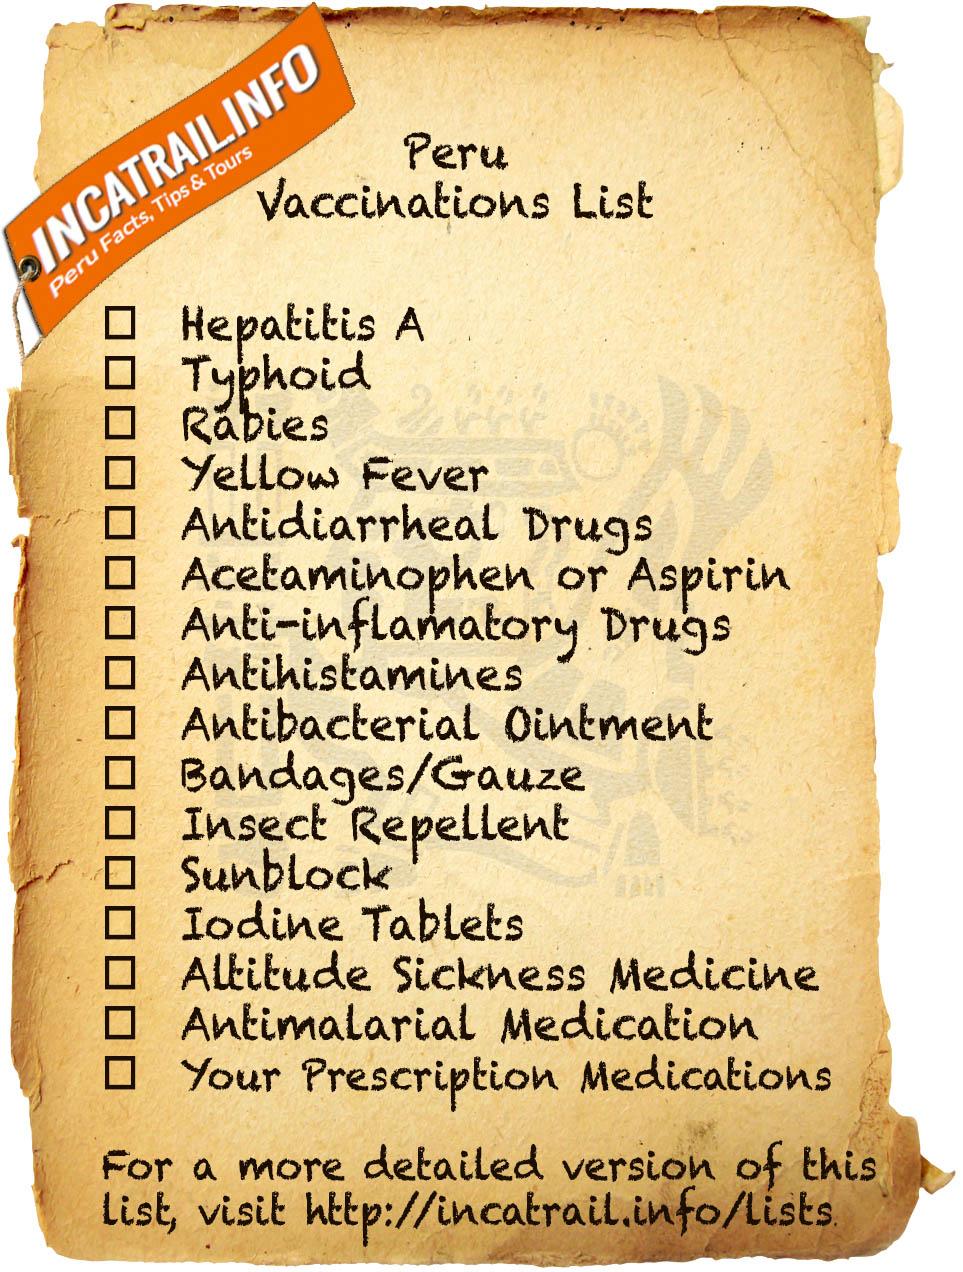 Peru Vaccinations List